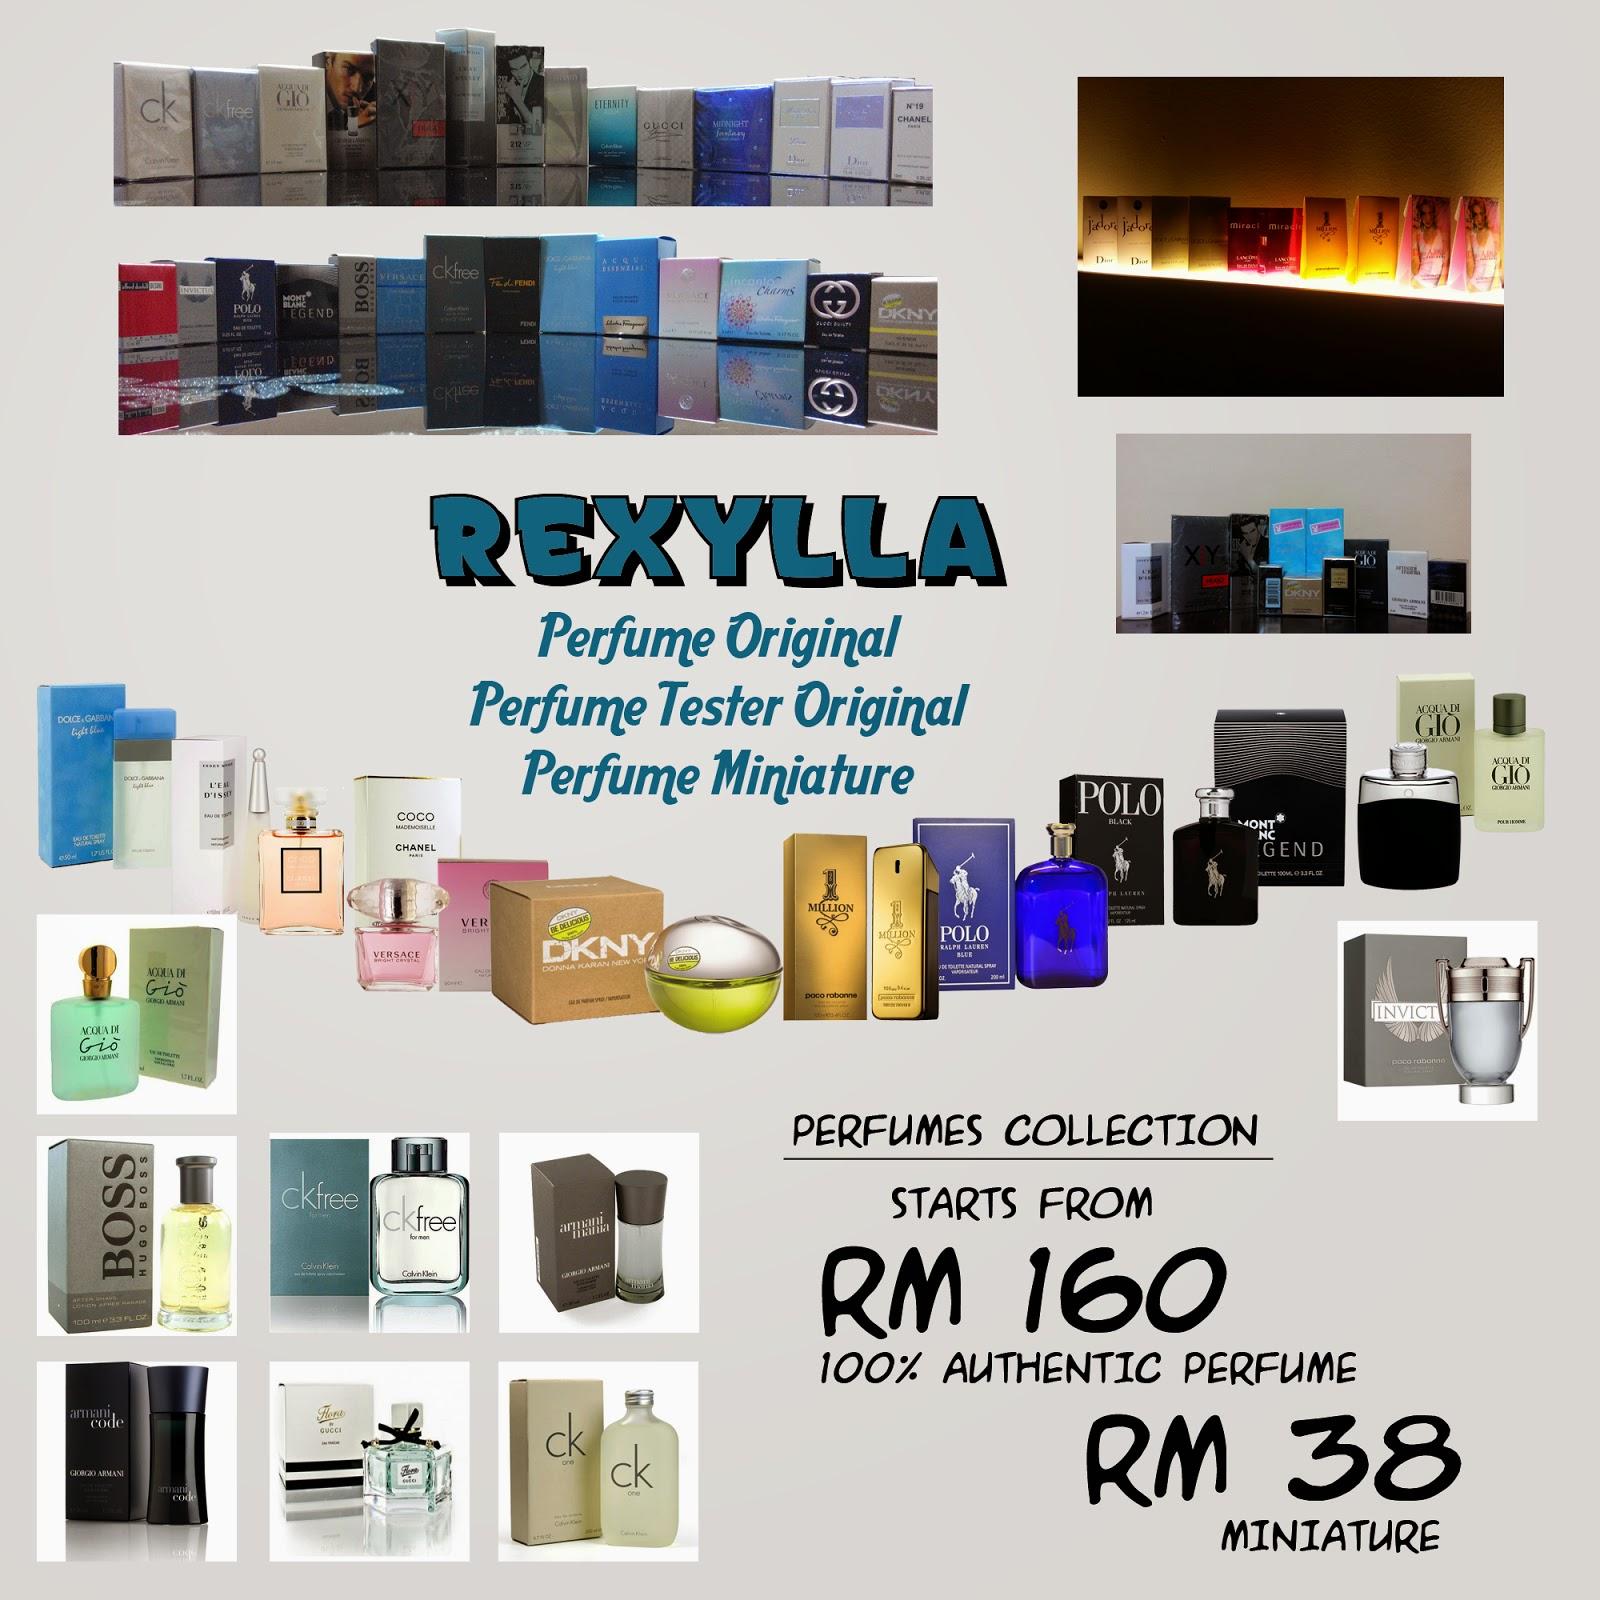 rexylla, perfume, authentic perfume, perfume miniature, perfume vial